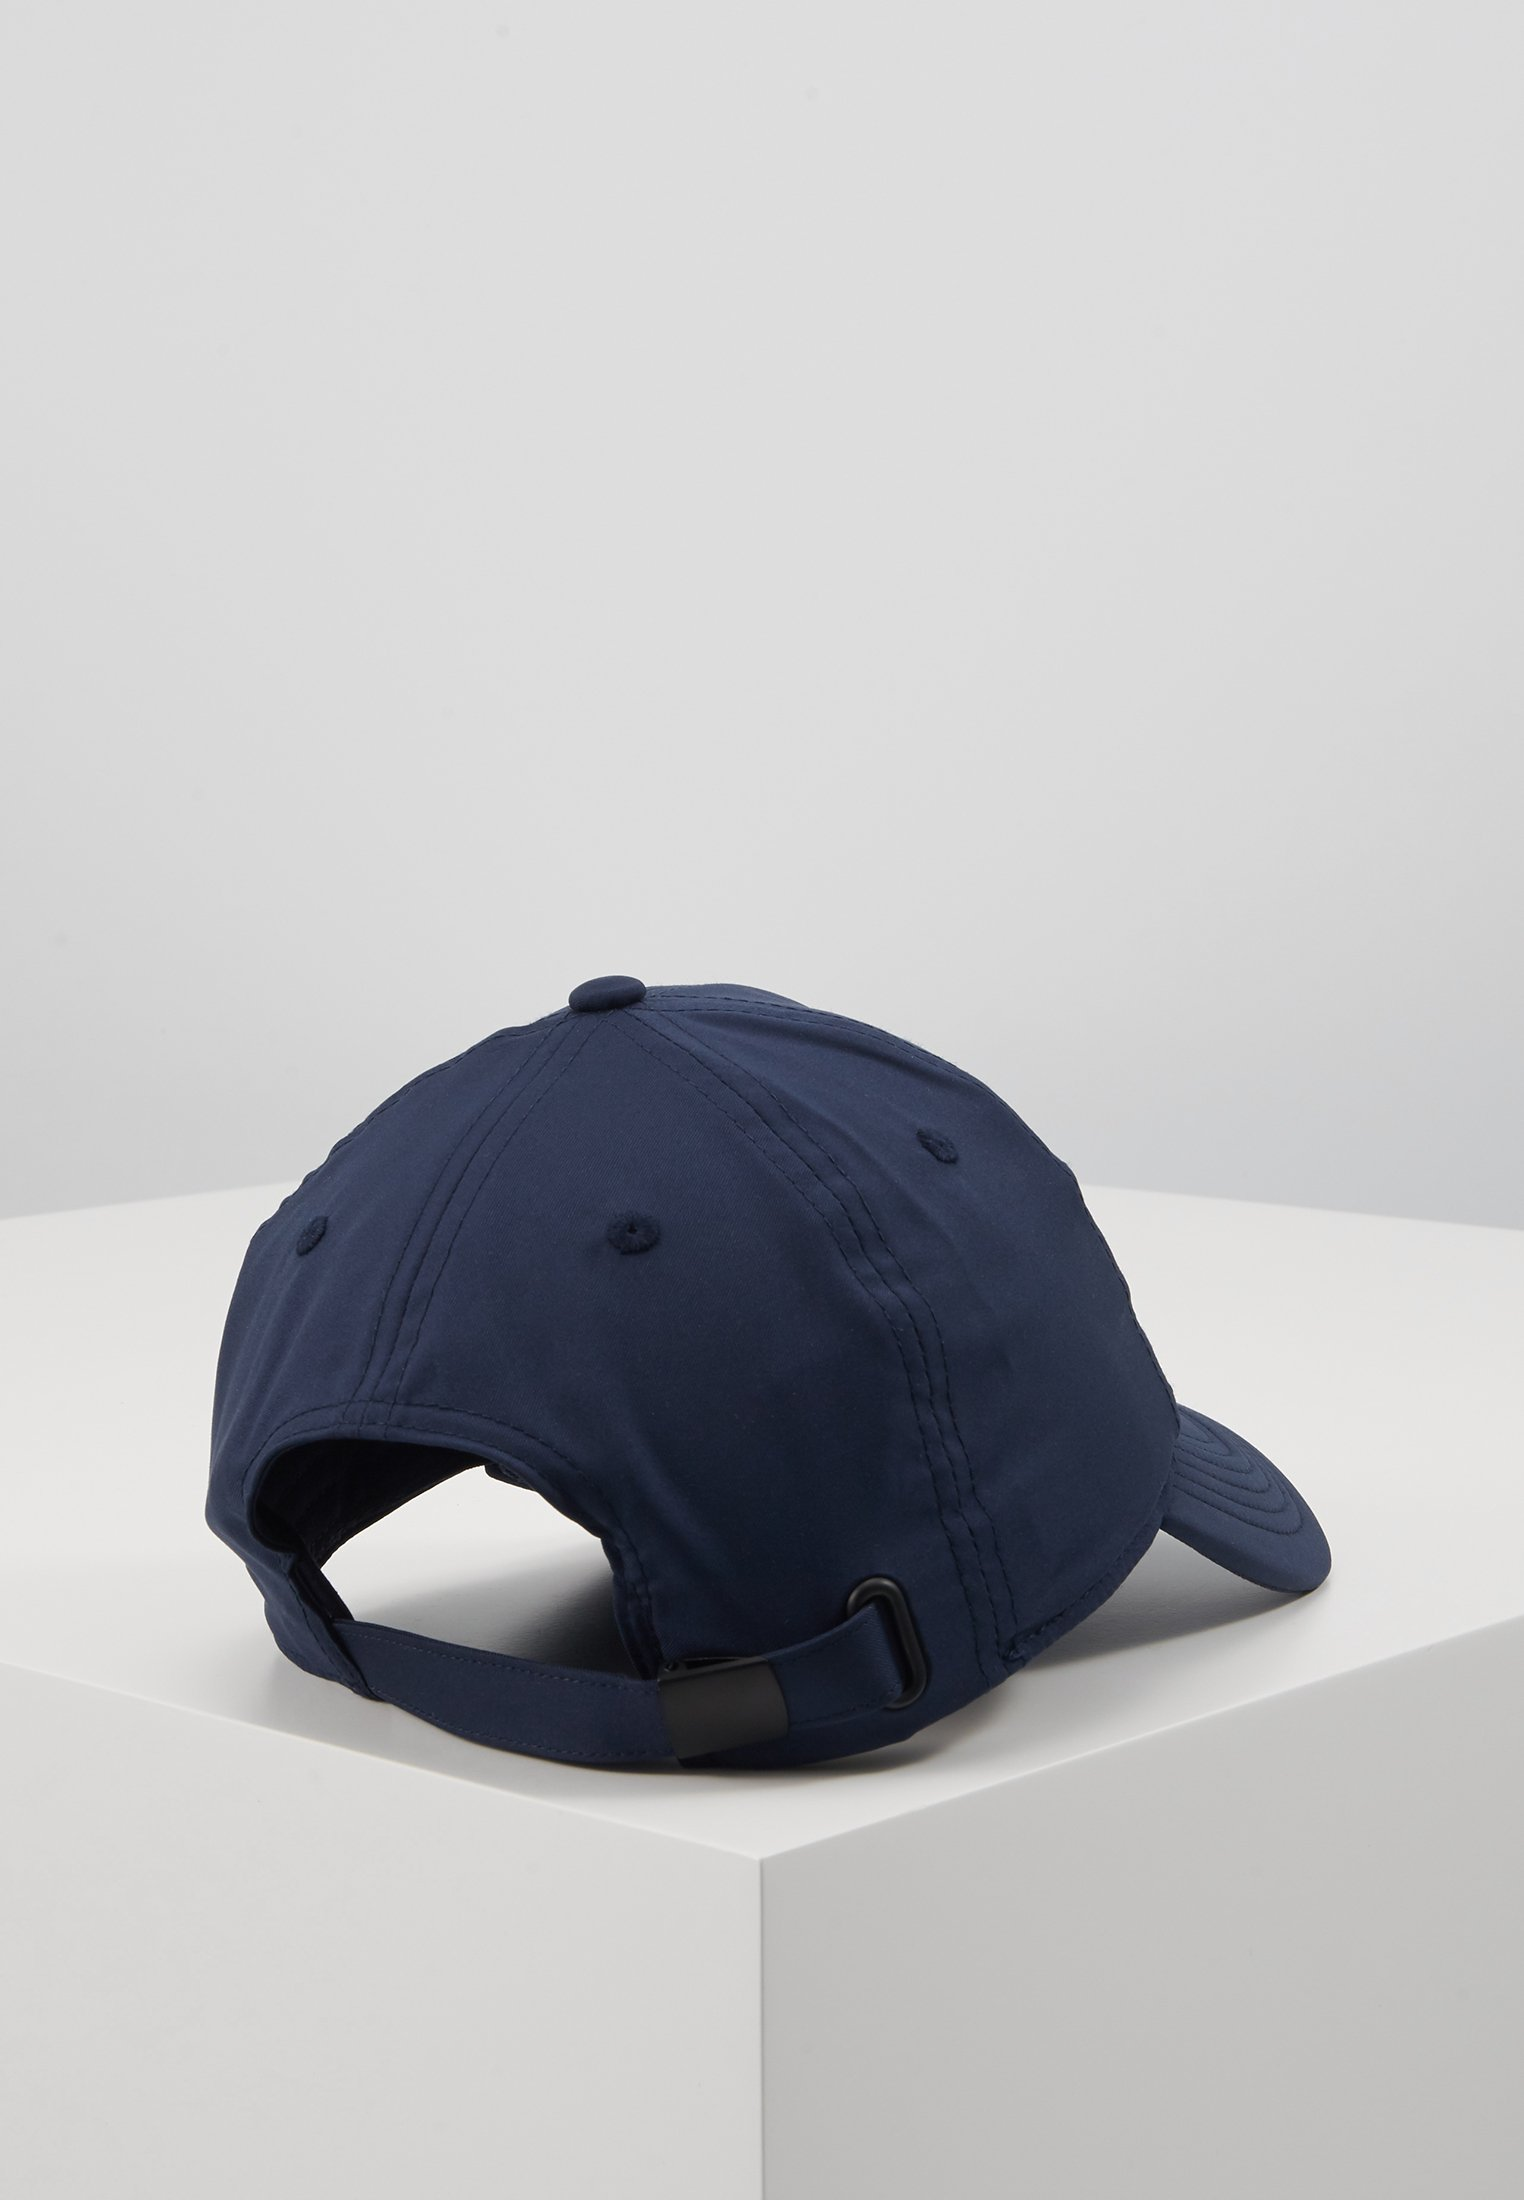 Nike Sportswear AROBILL - Cap - obsidian/black/mørkeblå zlCHCYjS60hT2Bv